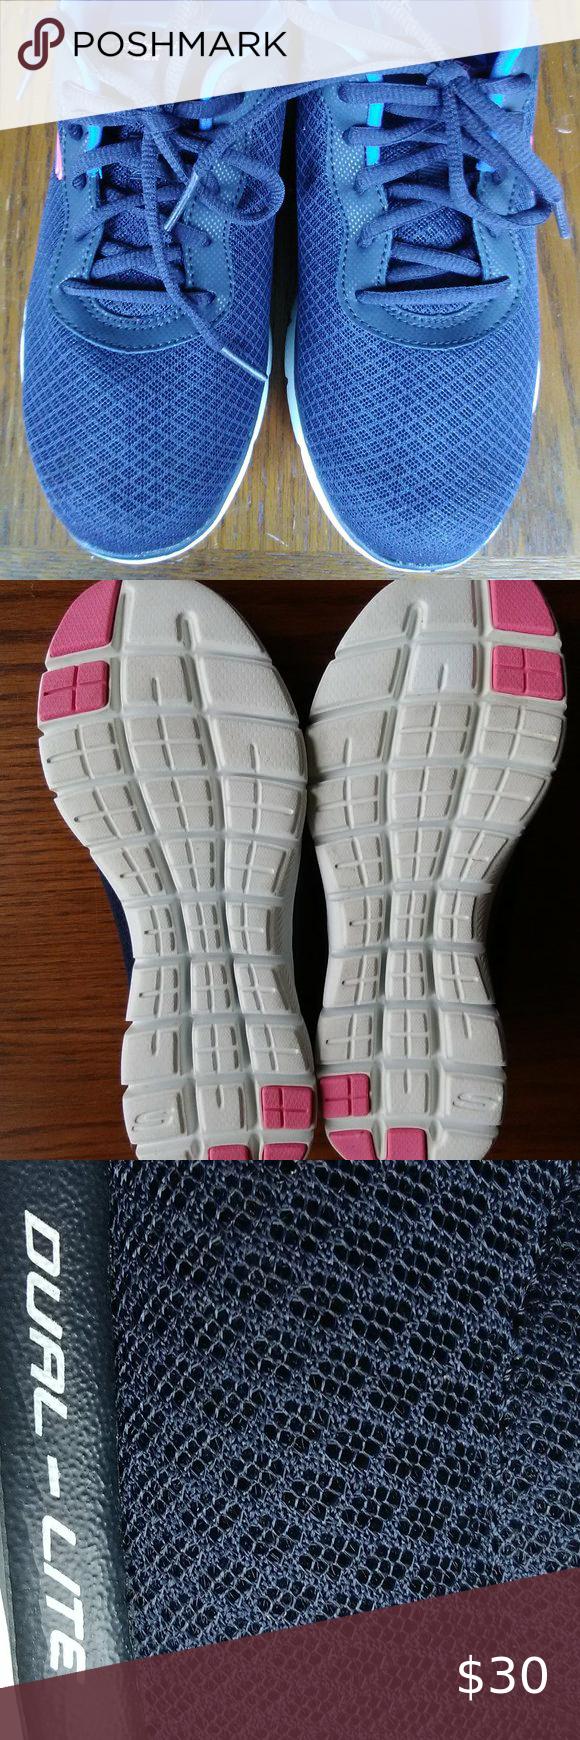 Skechers 8.5W Navy /pink Womens